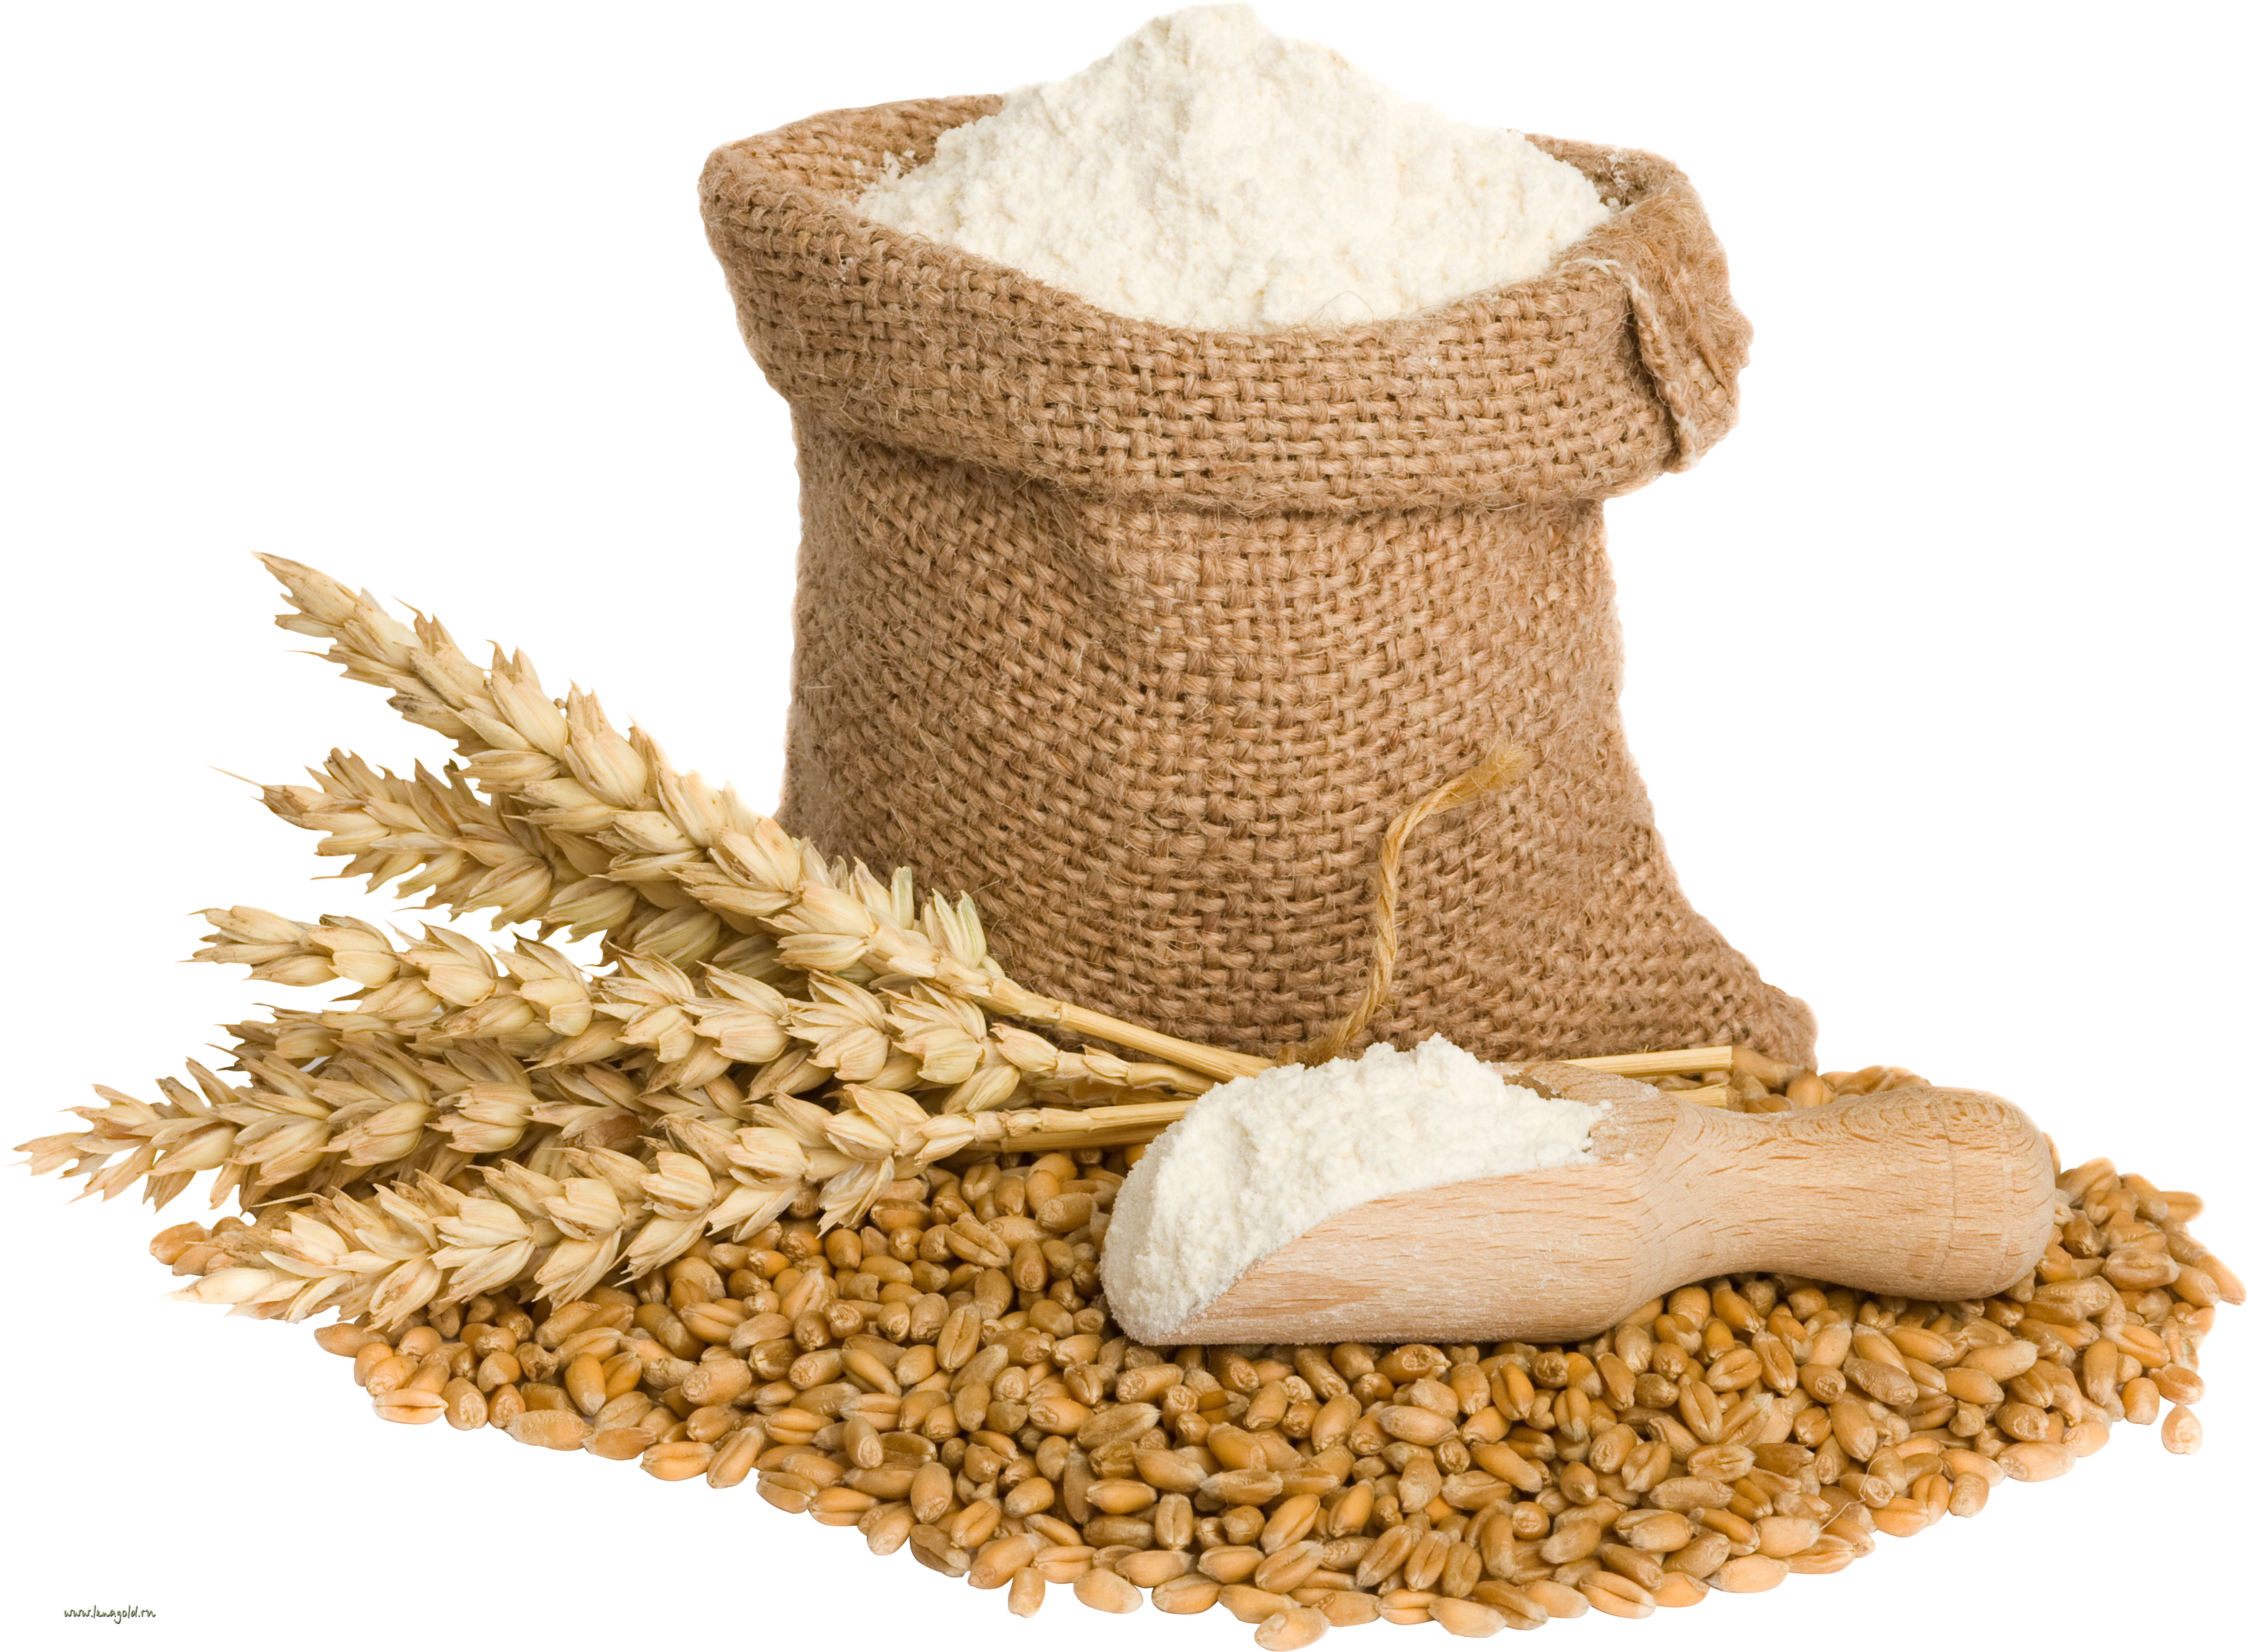 Wheat Png Image Gluten Grains Wheat Belly Psoriasis Gluten